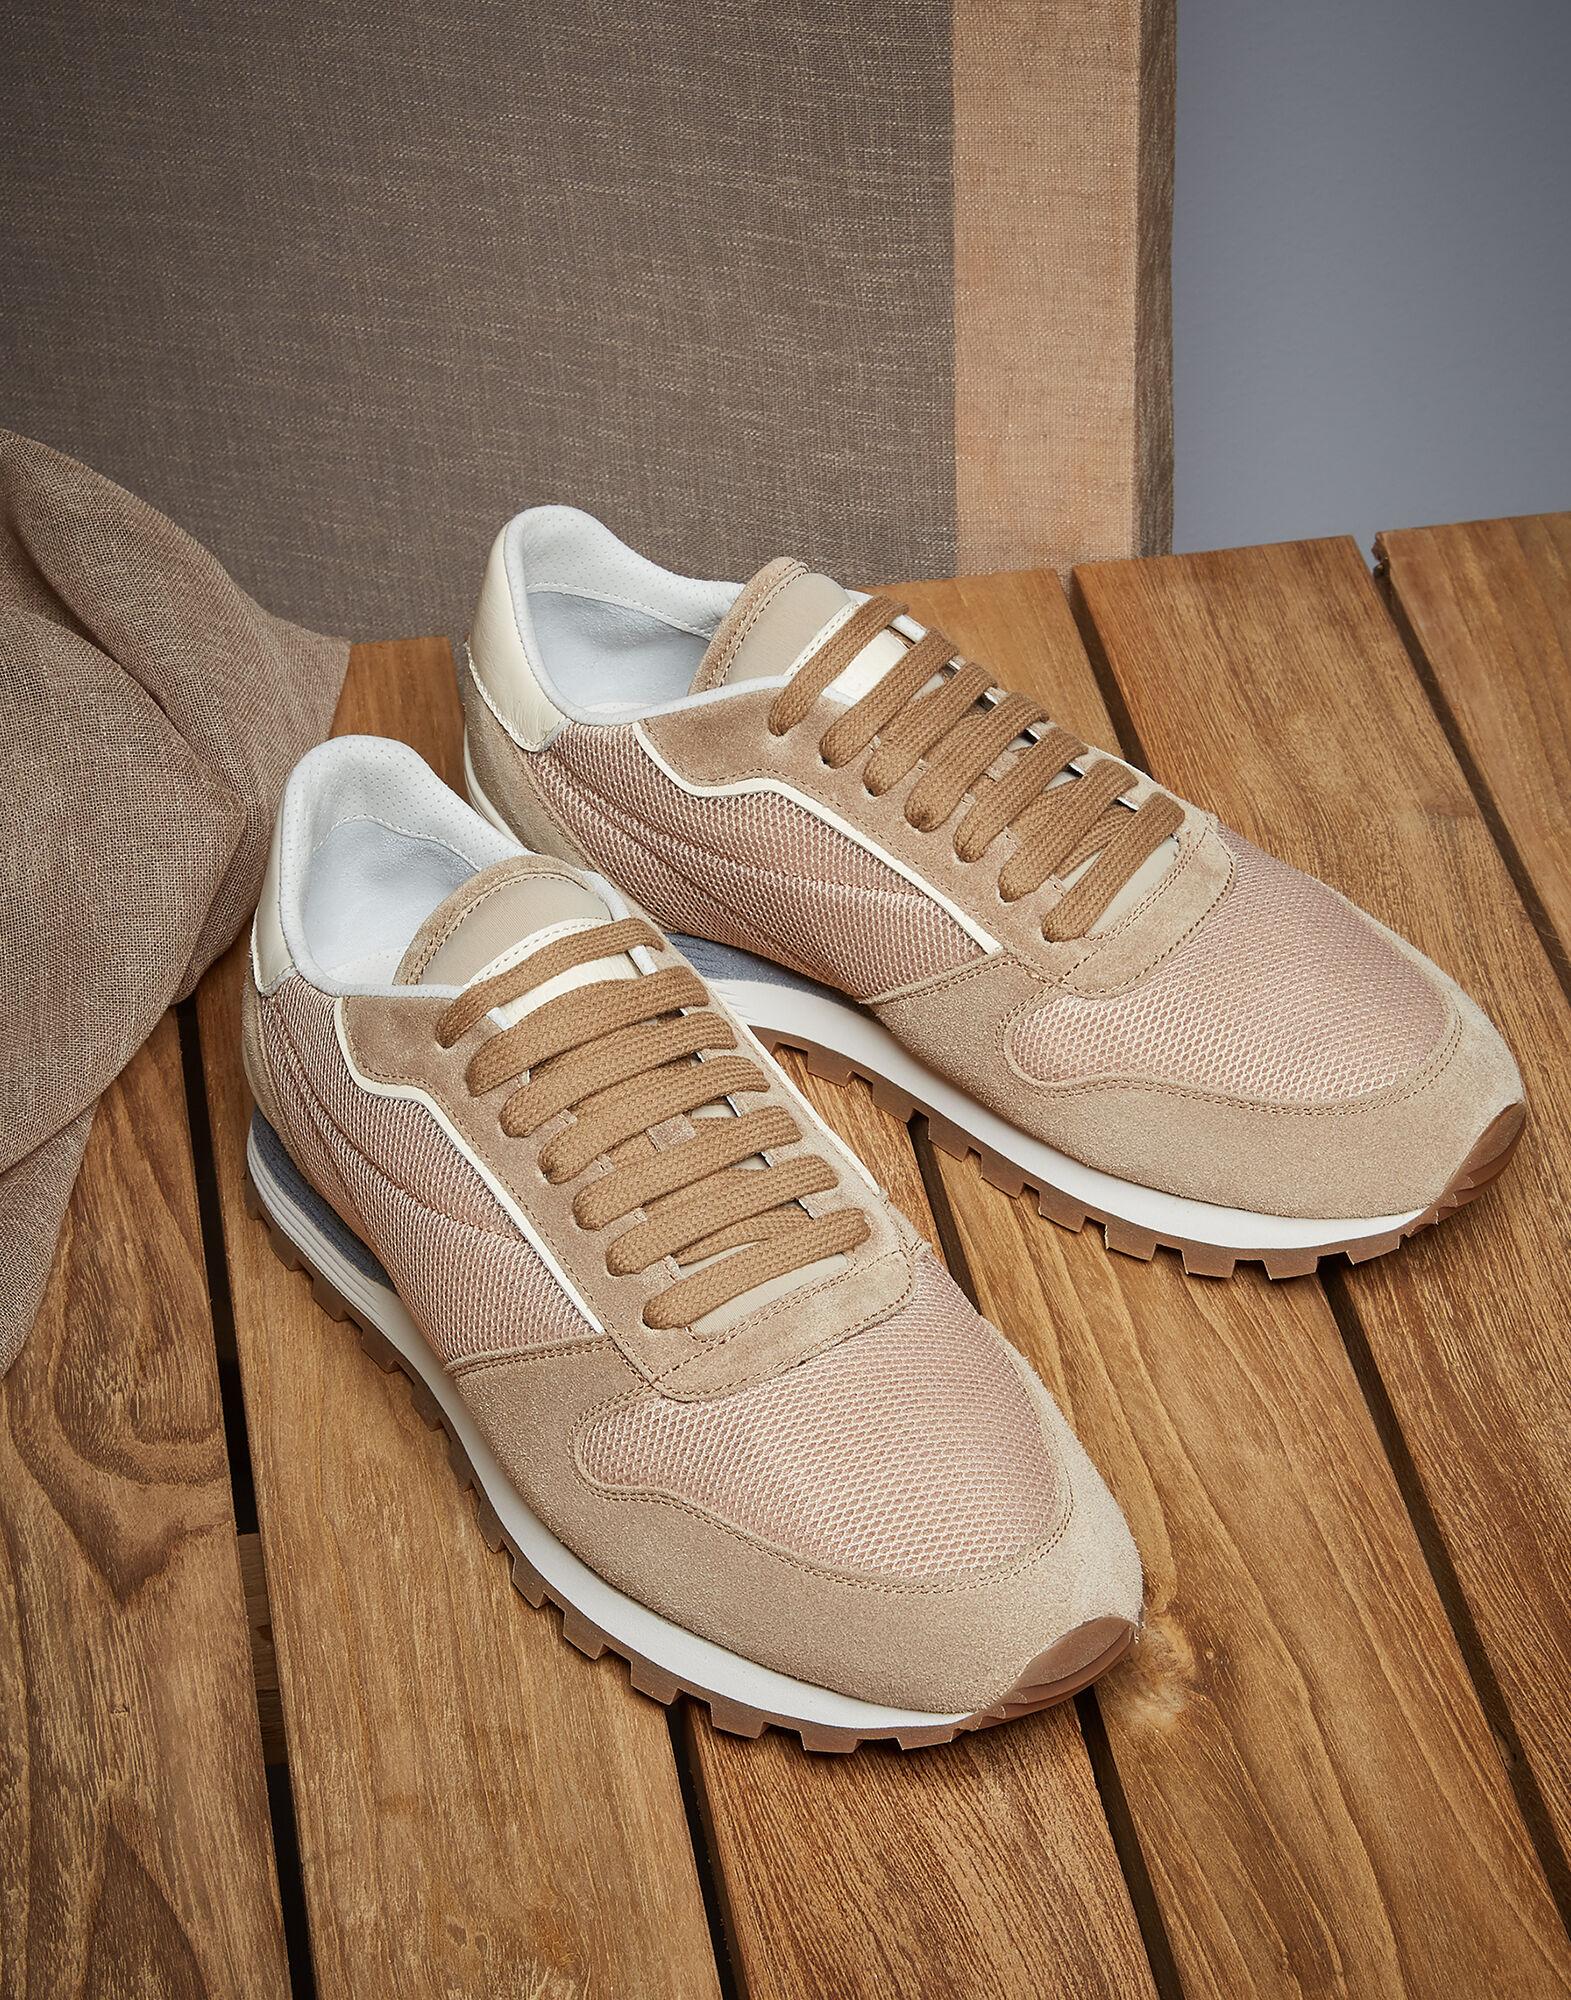 Sneakers (191MZUJSOA232) Herren Schuhe man ss19 | Brunello